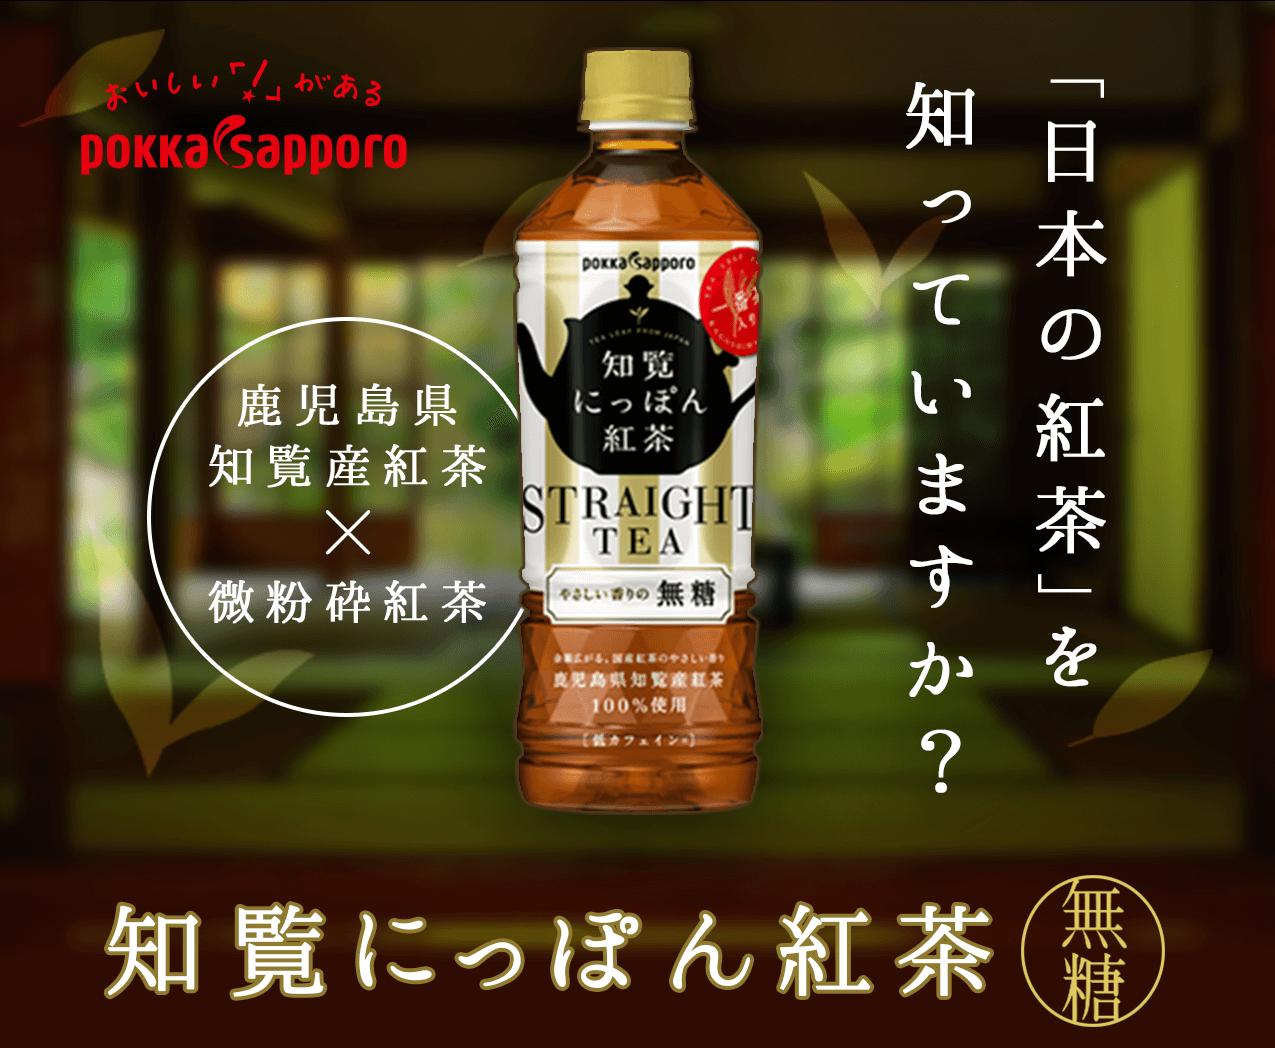 pokka sapporo「日本の紅茶」を知っていますか? 知覧にっぽん紅茶 無糖